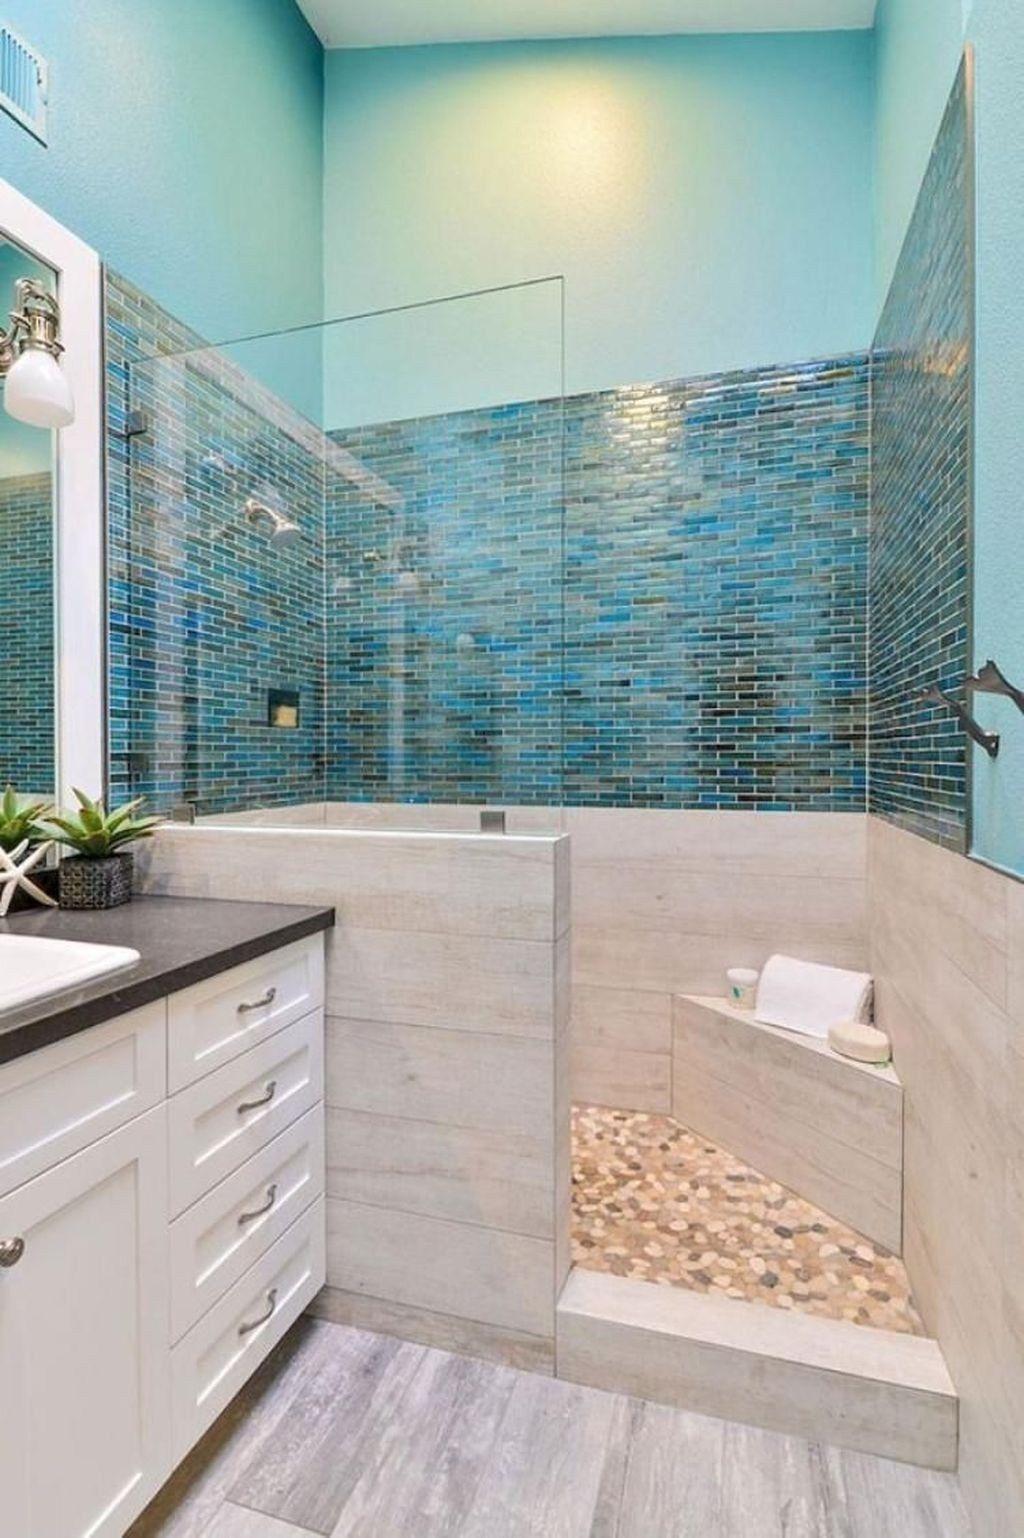 Beautiful Bathroom Decoration In A Coastal Style Decor 04 Beach